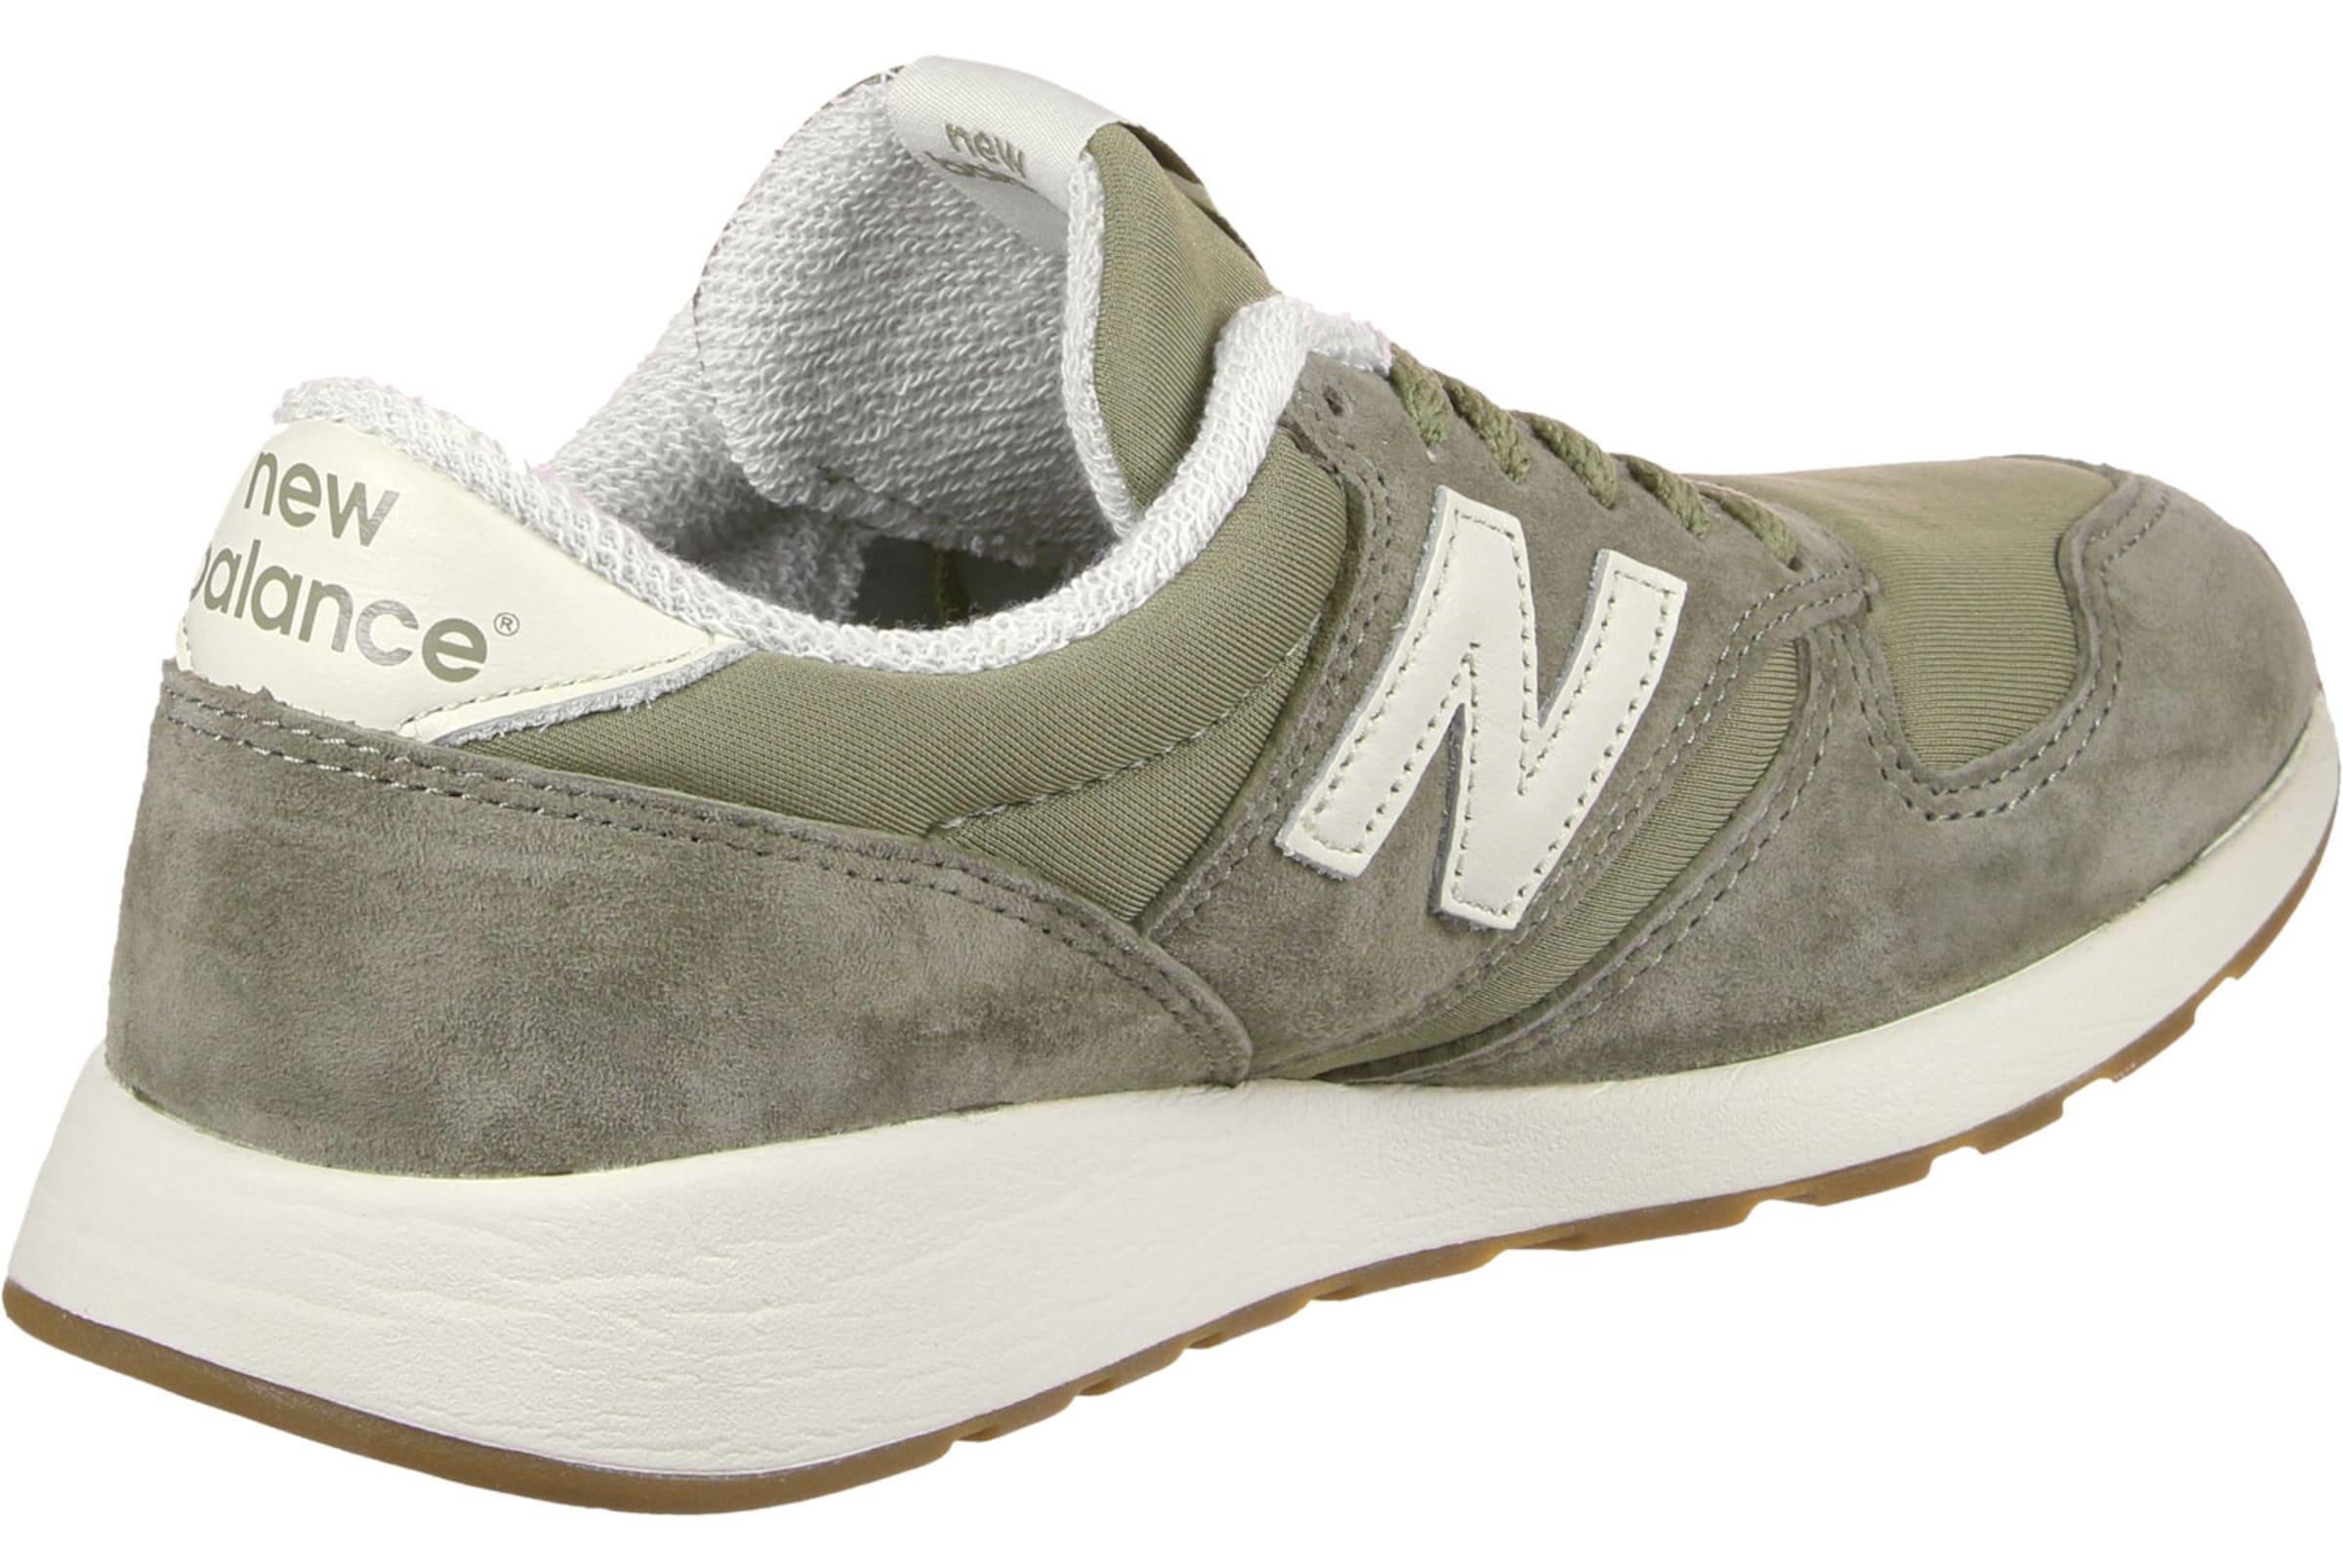 W' New Balance In Sneaker Oliv 'wrl420 QtxdChrs